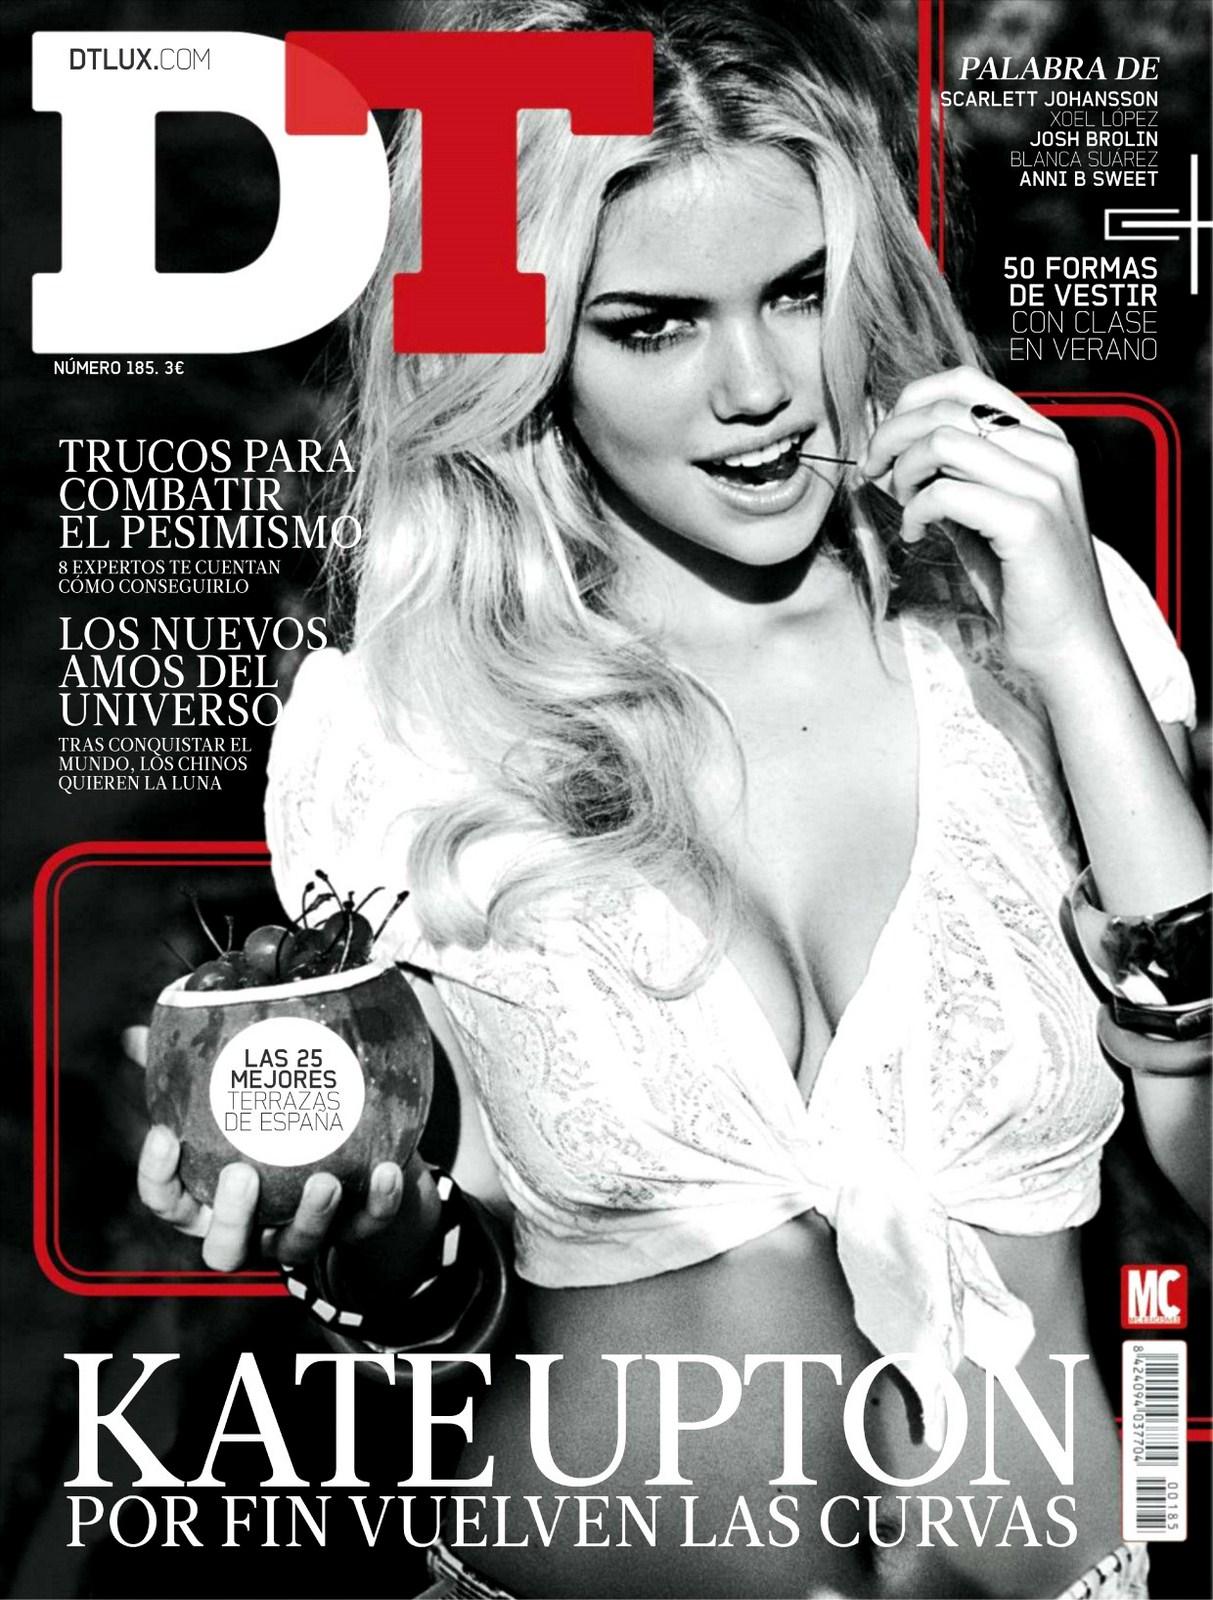 http://3.bp.blogspot.com/-HBKH7qFw7n0/T9zw2GLOD4I/AAAAAAAADBc/wEQkzTvkOrE/s1600/Kate+Upton+Covers+DT+Spain+May+2012+01.jpg